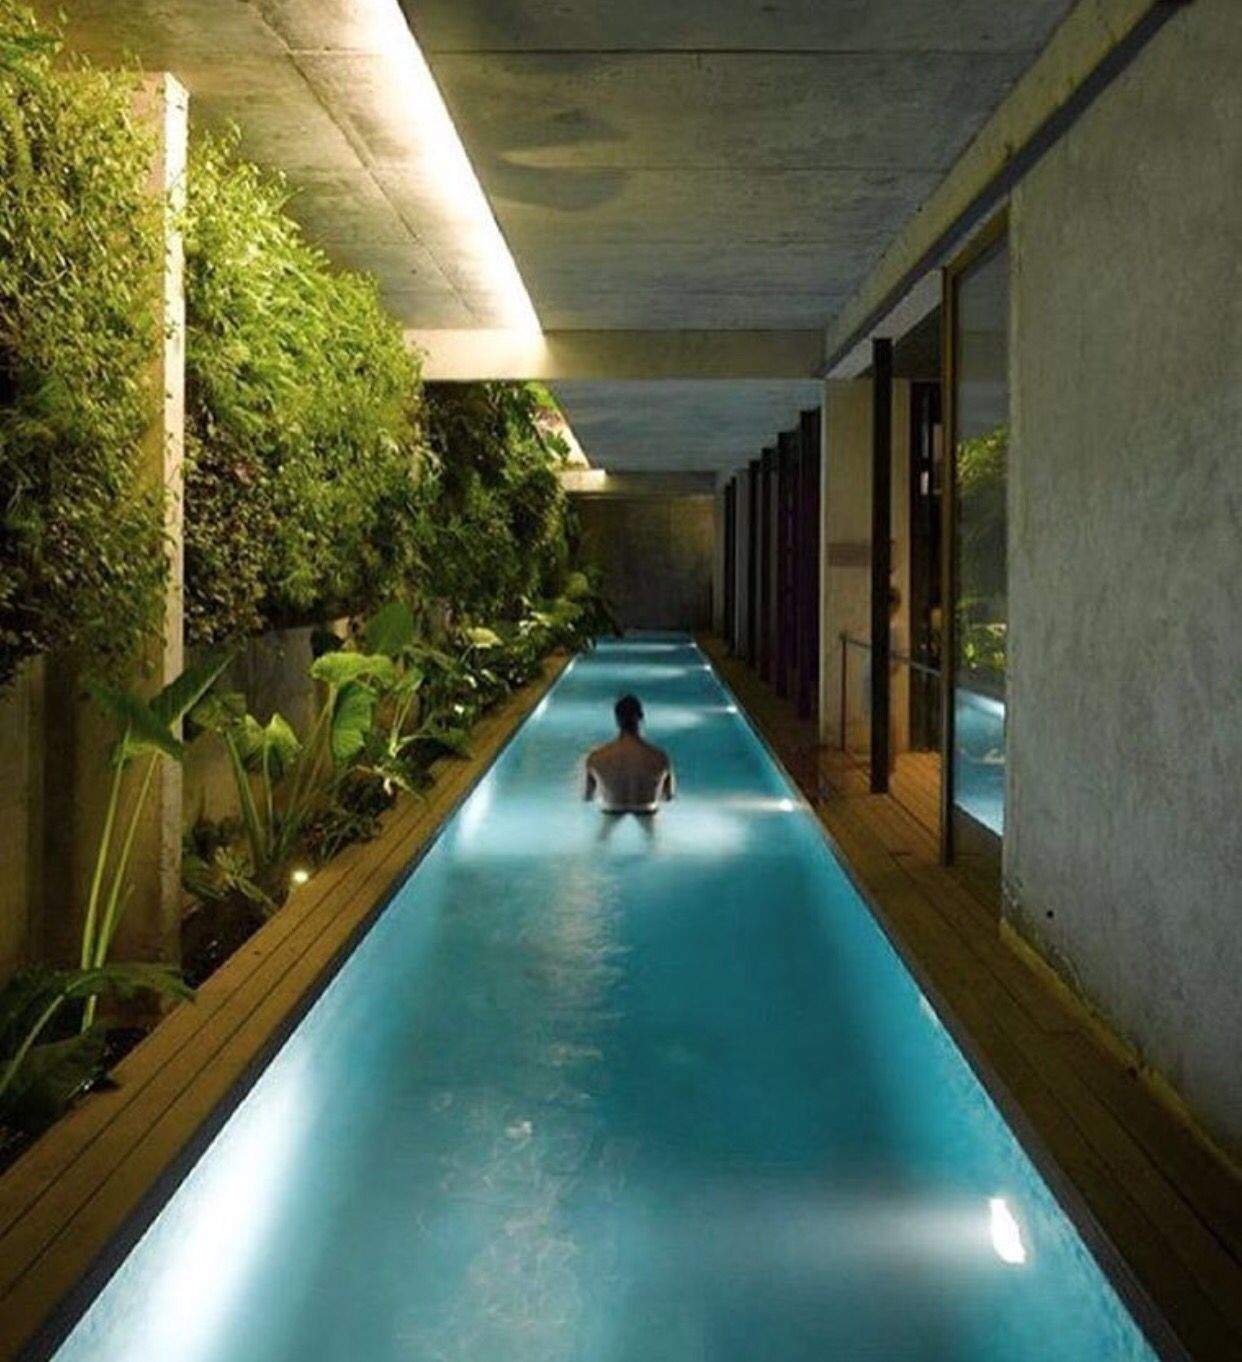 Lap Pool For 3 Rooms Pool Houses Swimming Pool Designs